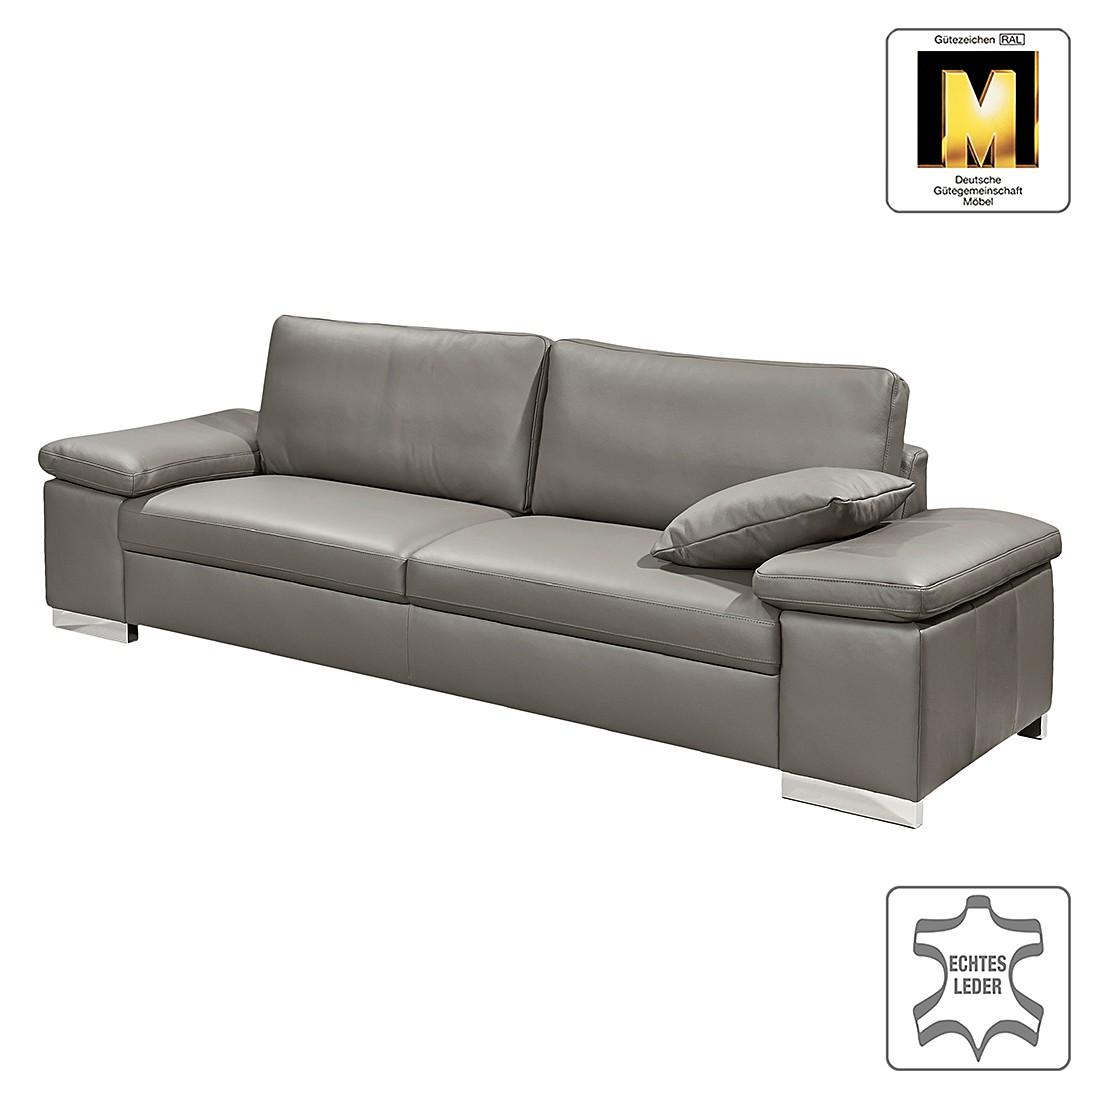 Sofa Casual Line V (2,5-Sitzer) – Echtleder – Grau – Gedecktes Dickleder, Claas Claasen kaufen